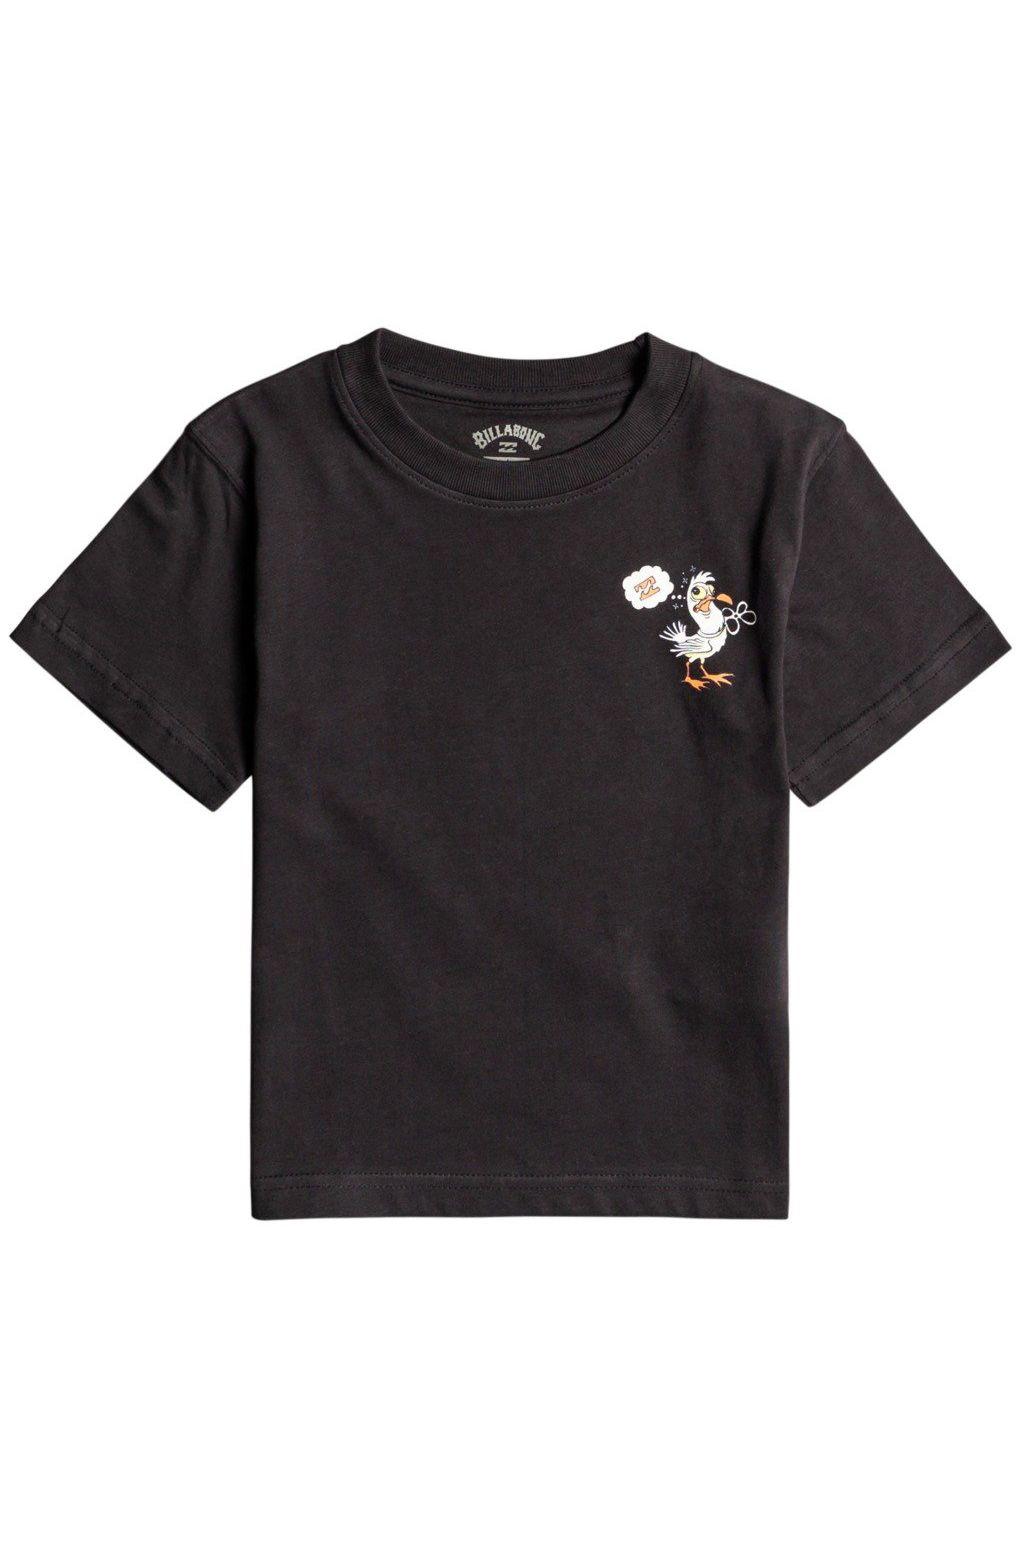 T-Shirt Billabong ENCOUTERS SS TODDLER Black